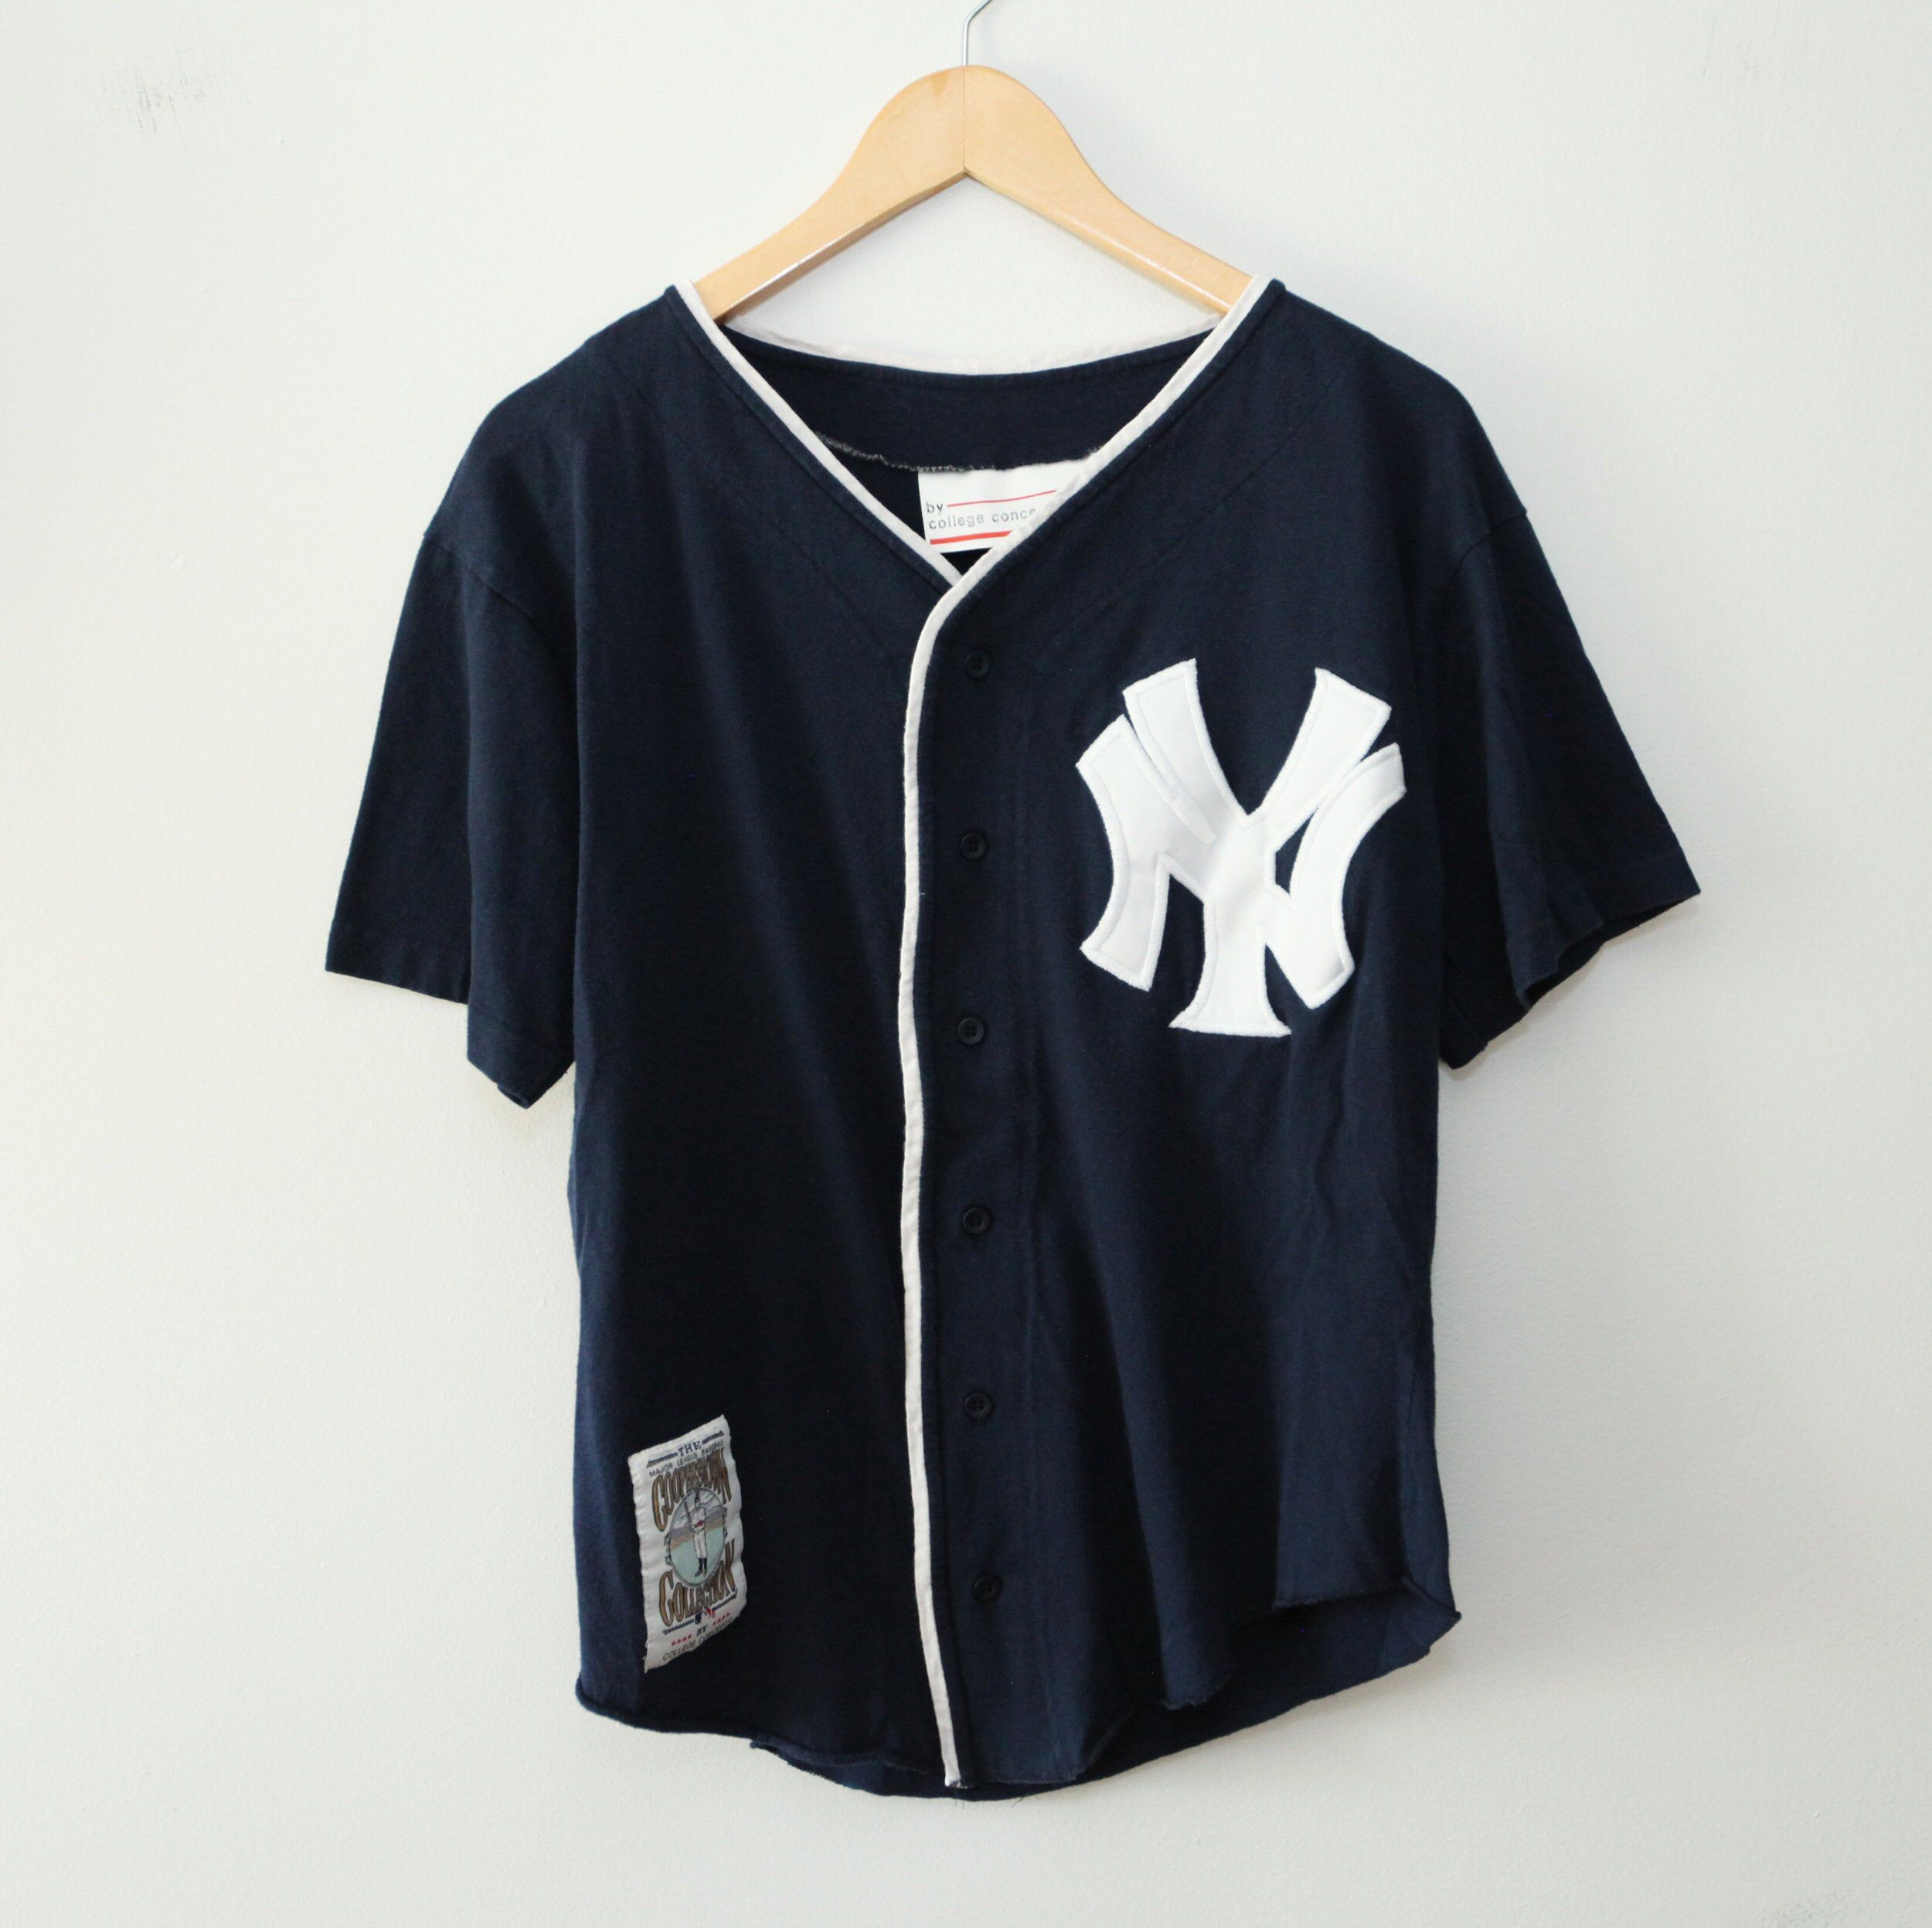 Vintage 90 S New York Yankees Jersey Sz Women S Vintage Sportswear New York Yankees Women